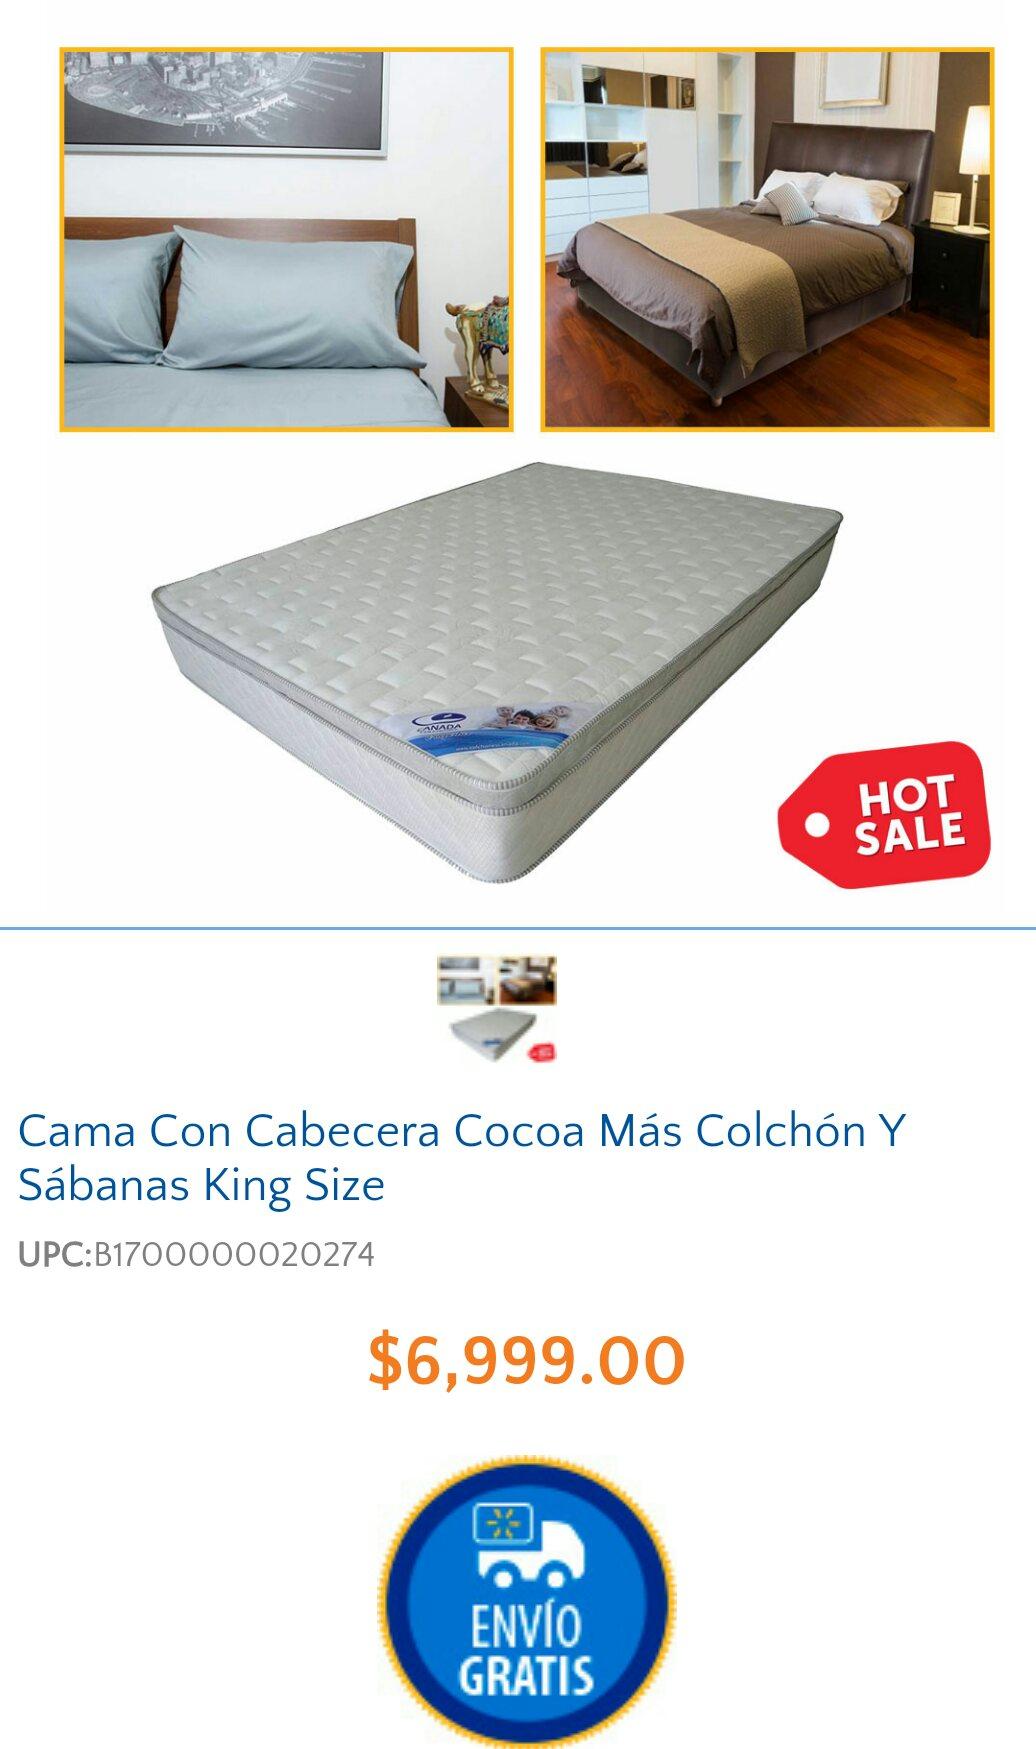 Hot Sale 2015 en Walmart: Paquete Base + cabecera + Colchon Therapy Foam + Sabanas de algodon en KING SIZE: $6,999